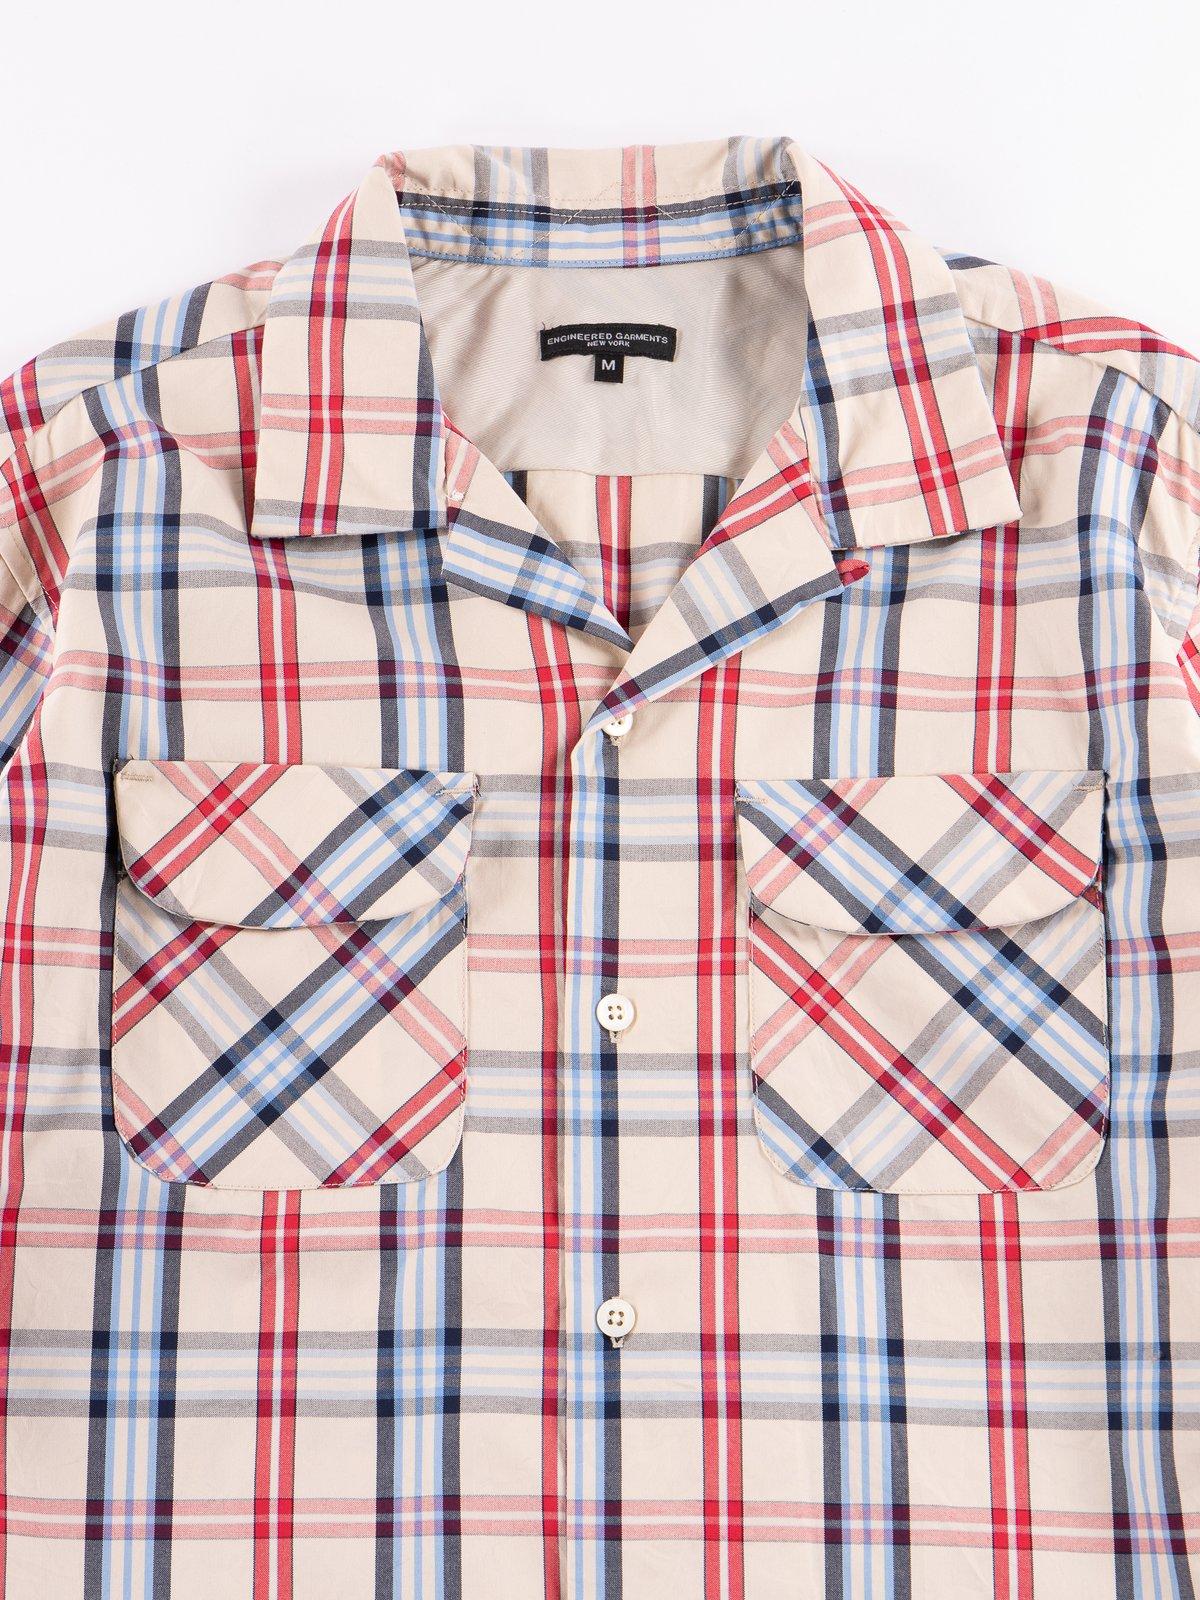 Khaki/Red/Blue Plaid Classic Shirt - Image 3